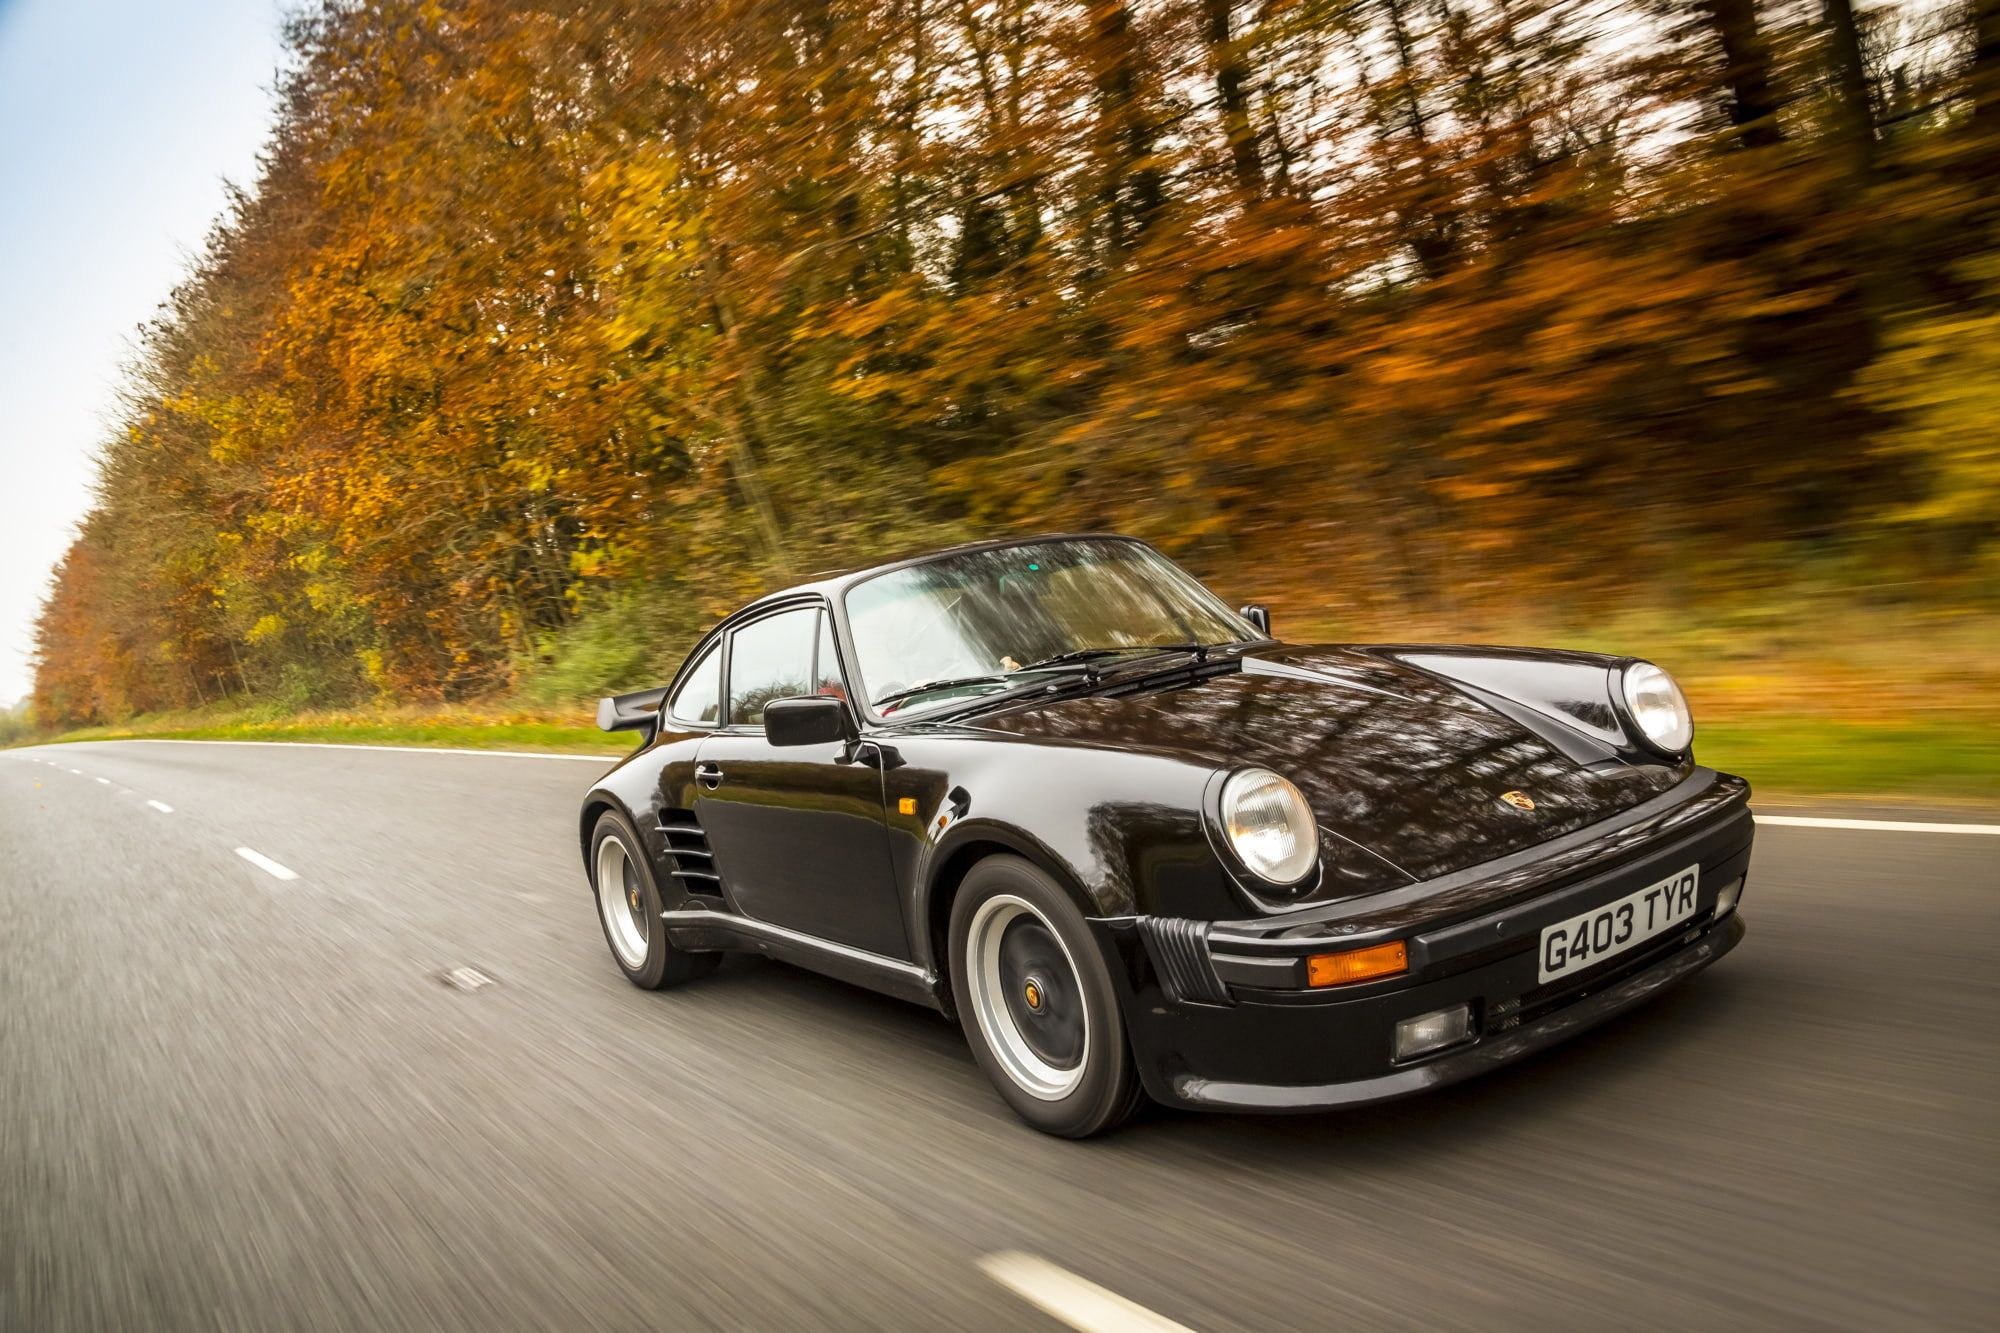 Pin By A J On Economics Porsche Porsche 911 Turbo Turbo